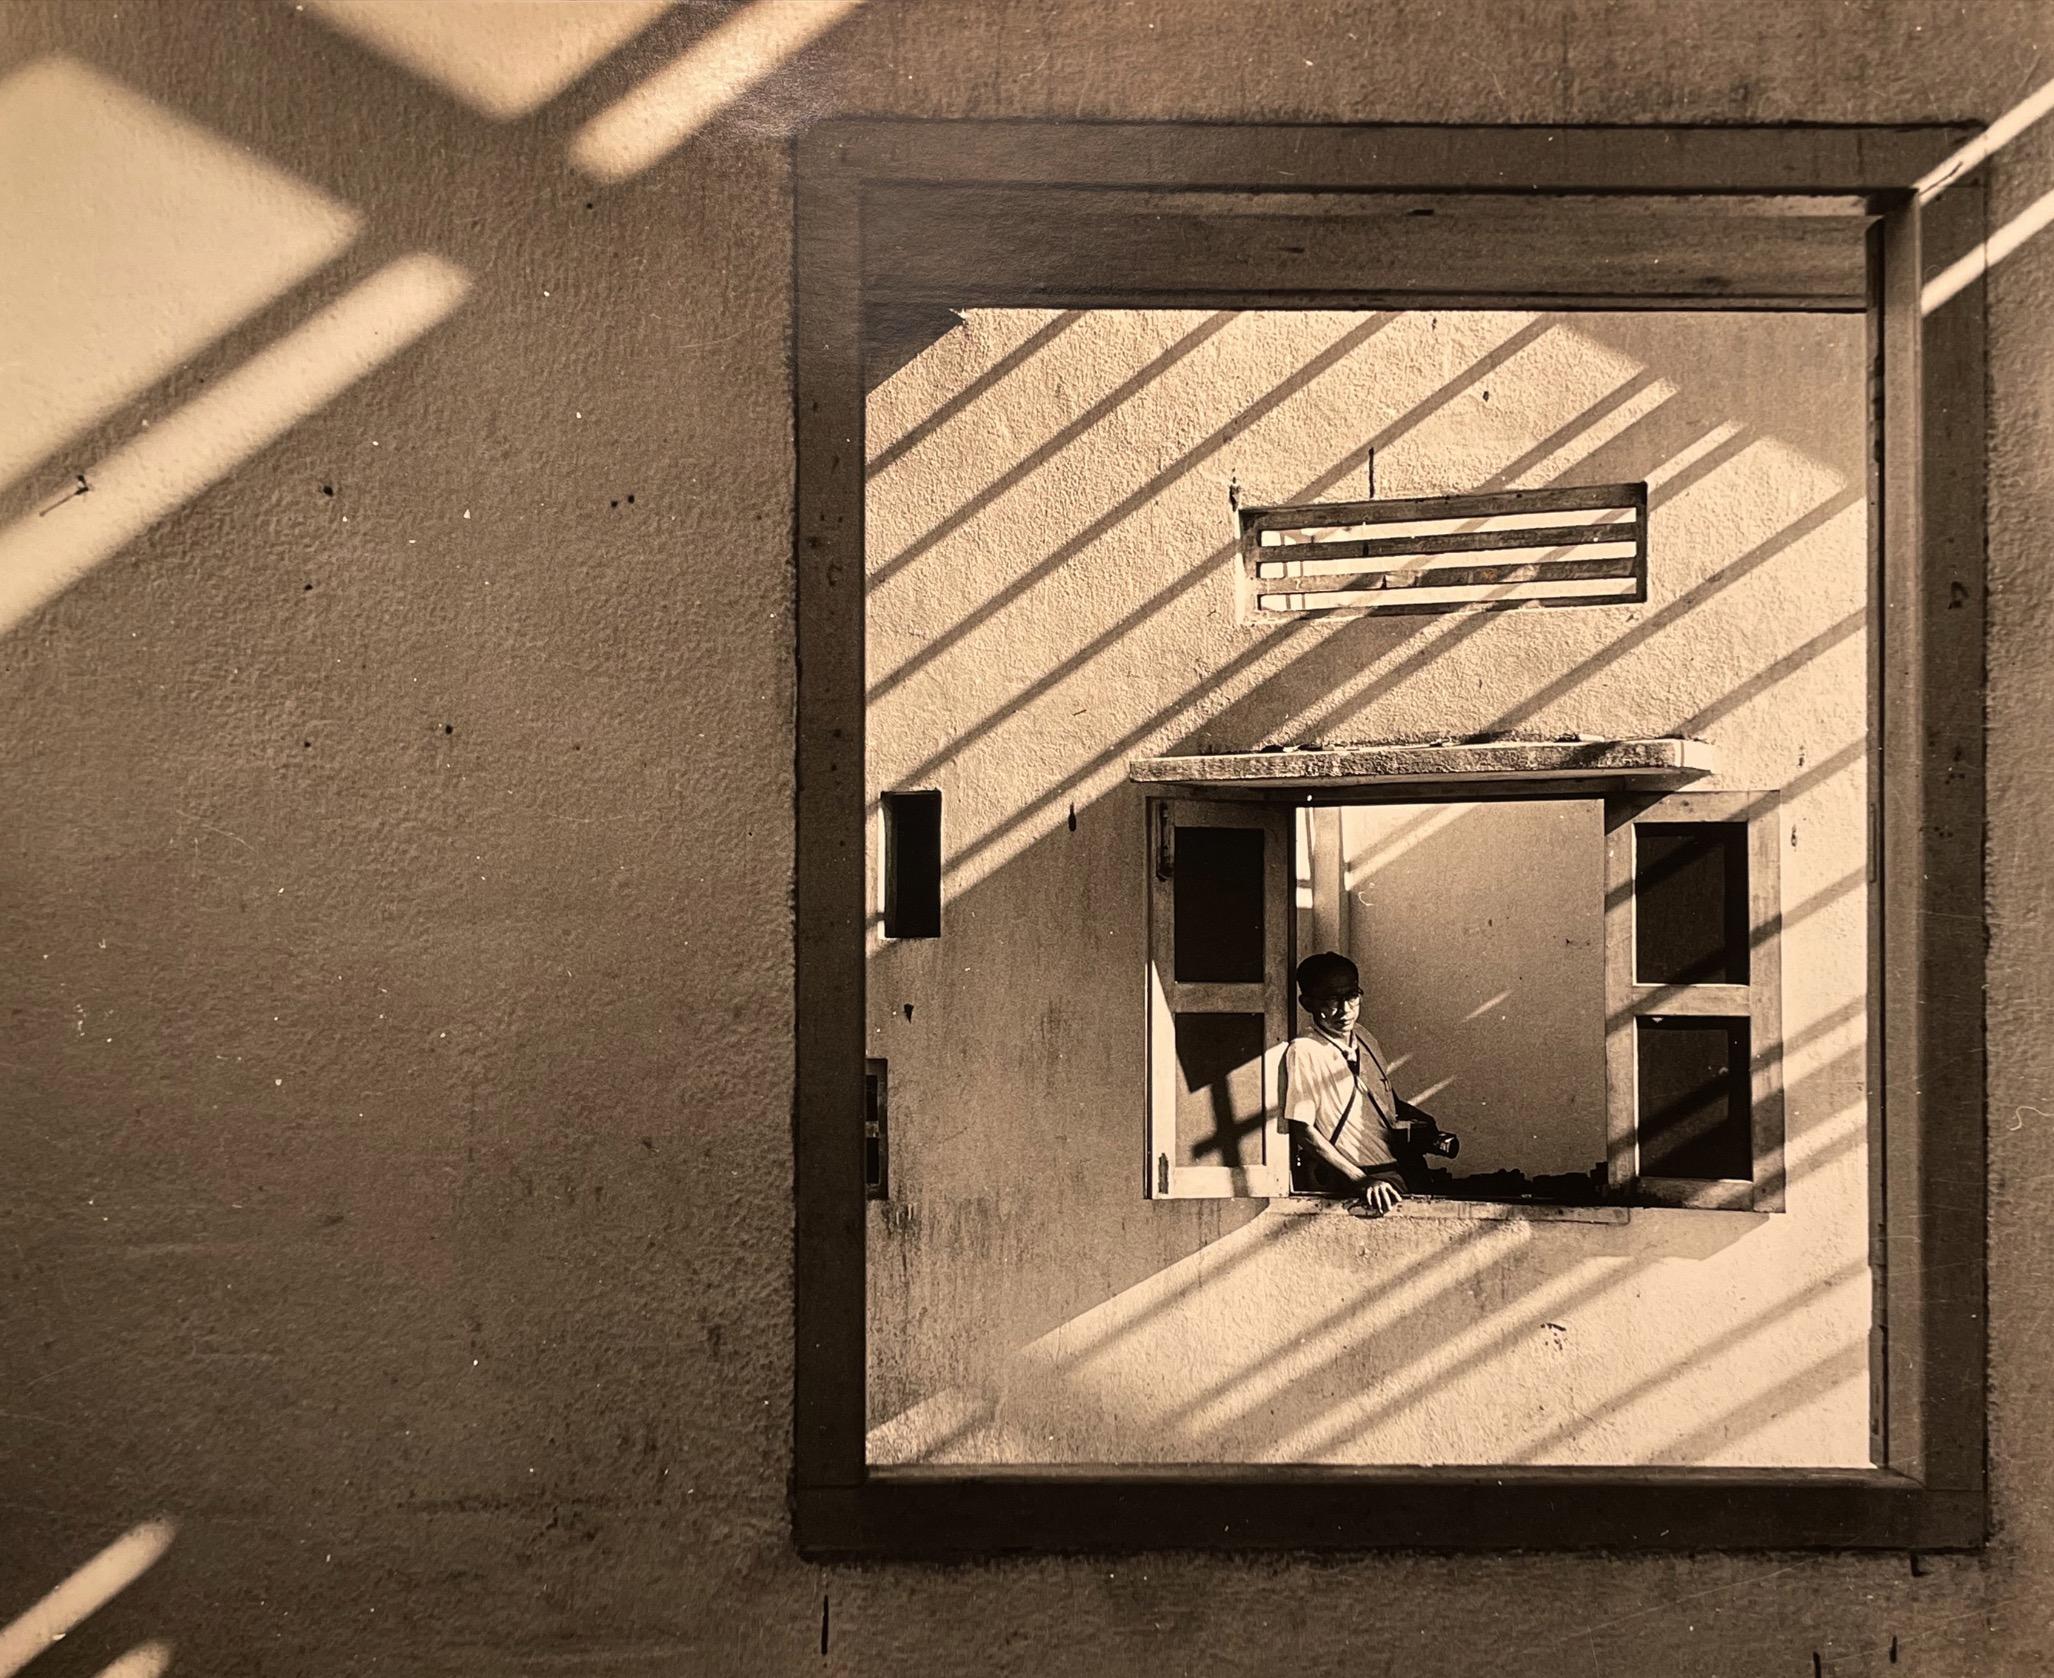 Yip Cheong Fun, Photographer's View, silver gelatin print